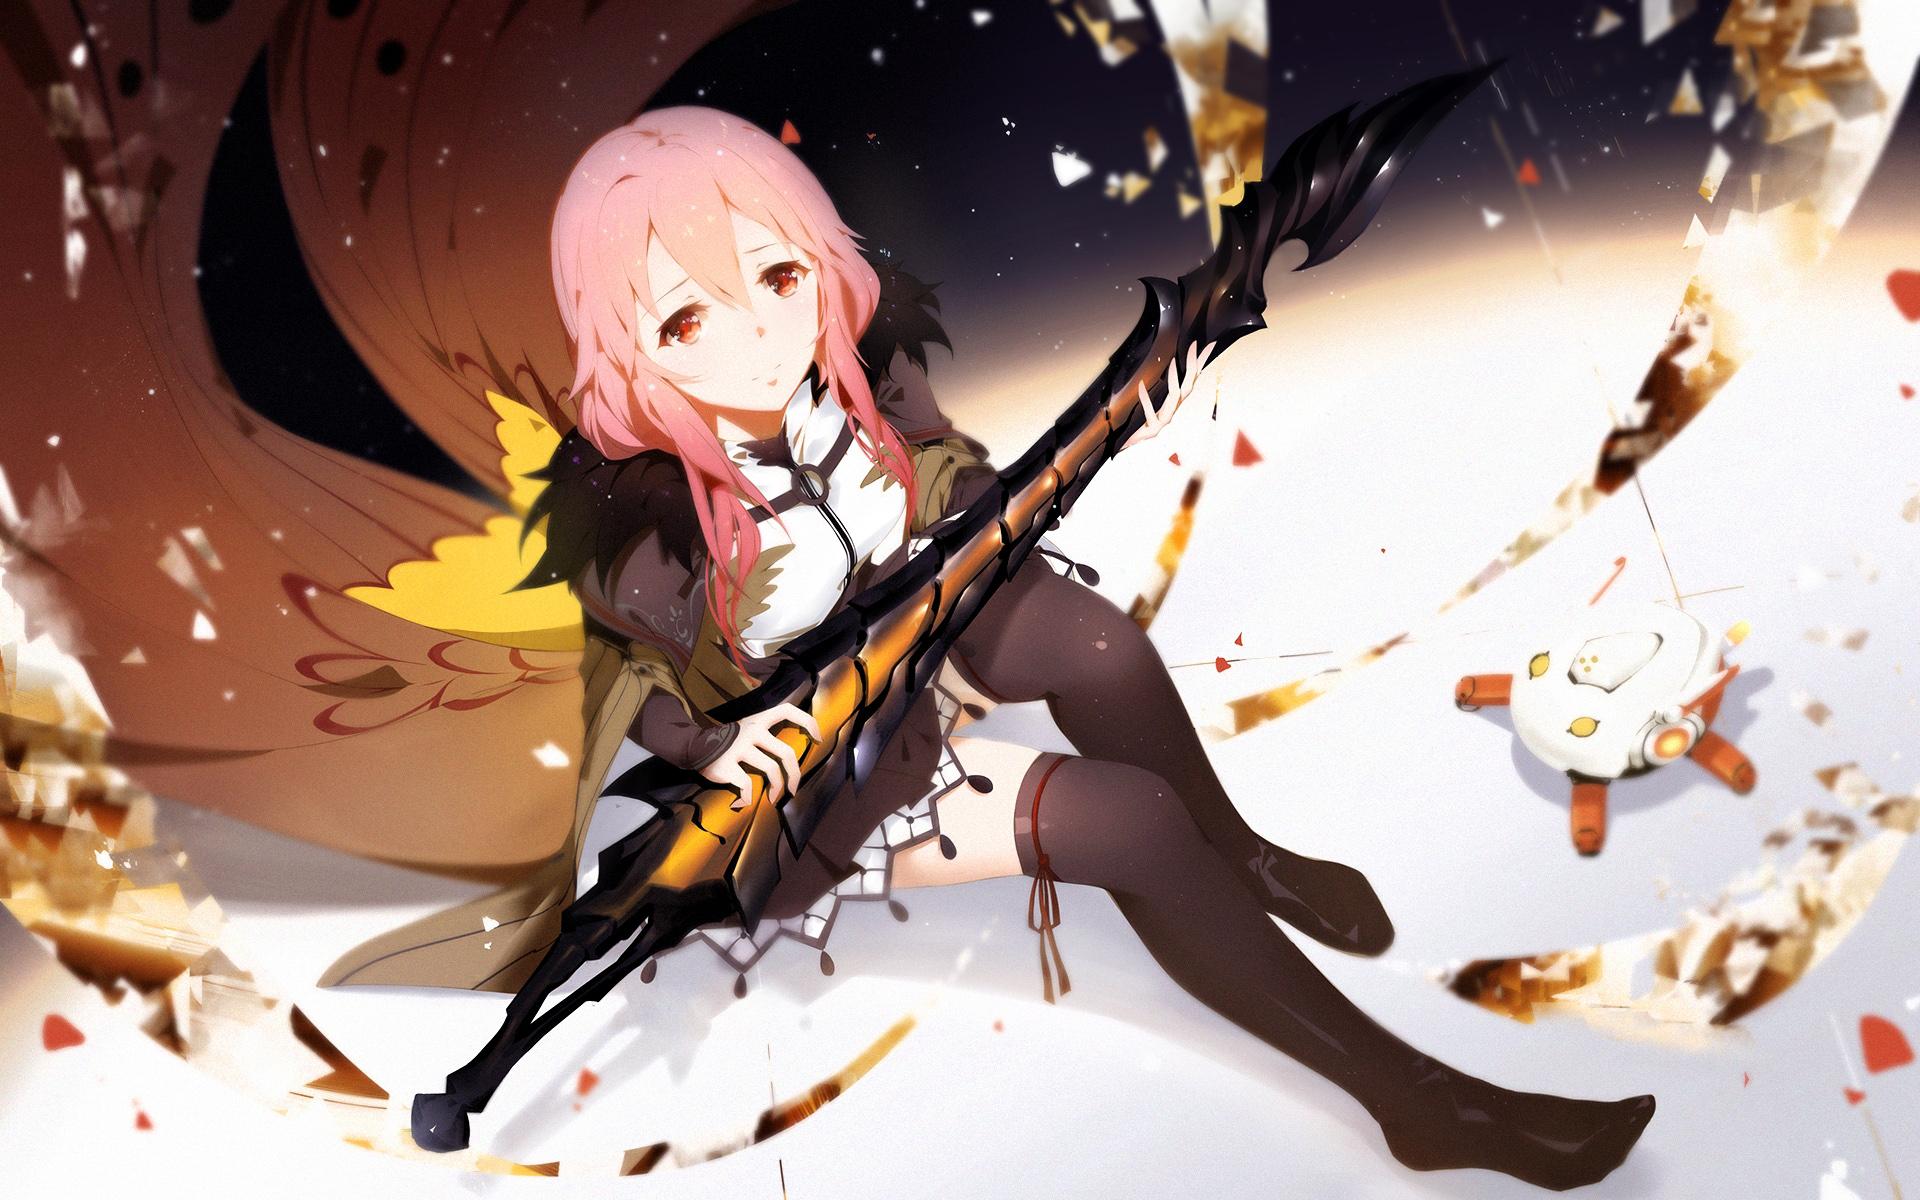 Anime anime girls inori yuzuriha guilty crown sword red eyes pink hair leggings sitting looking up